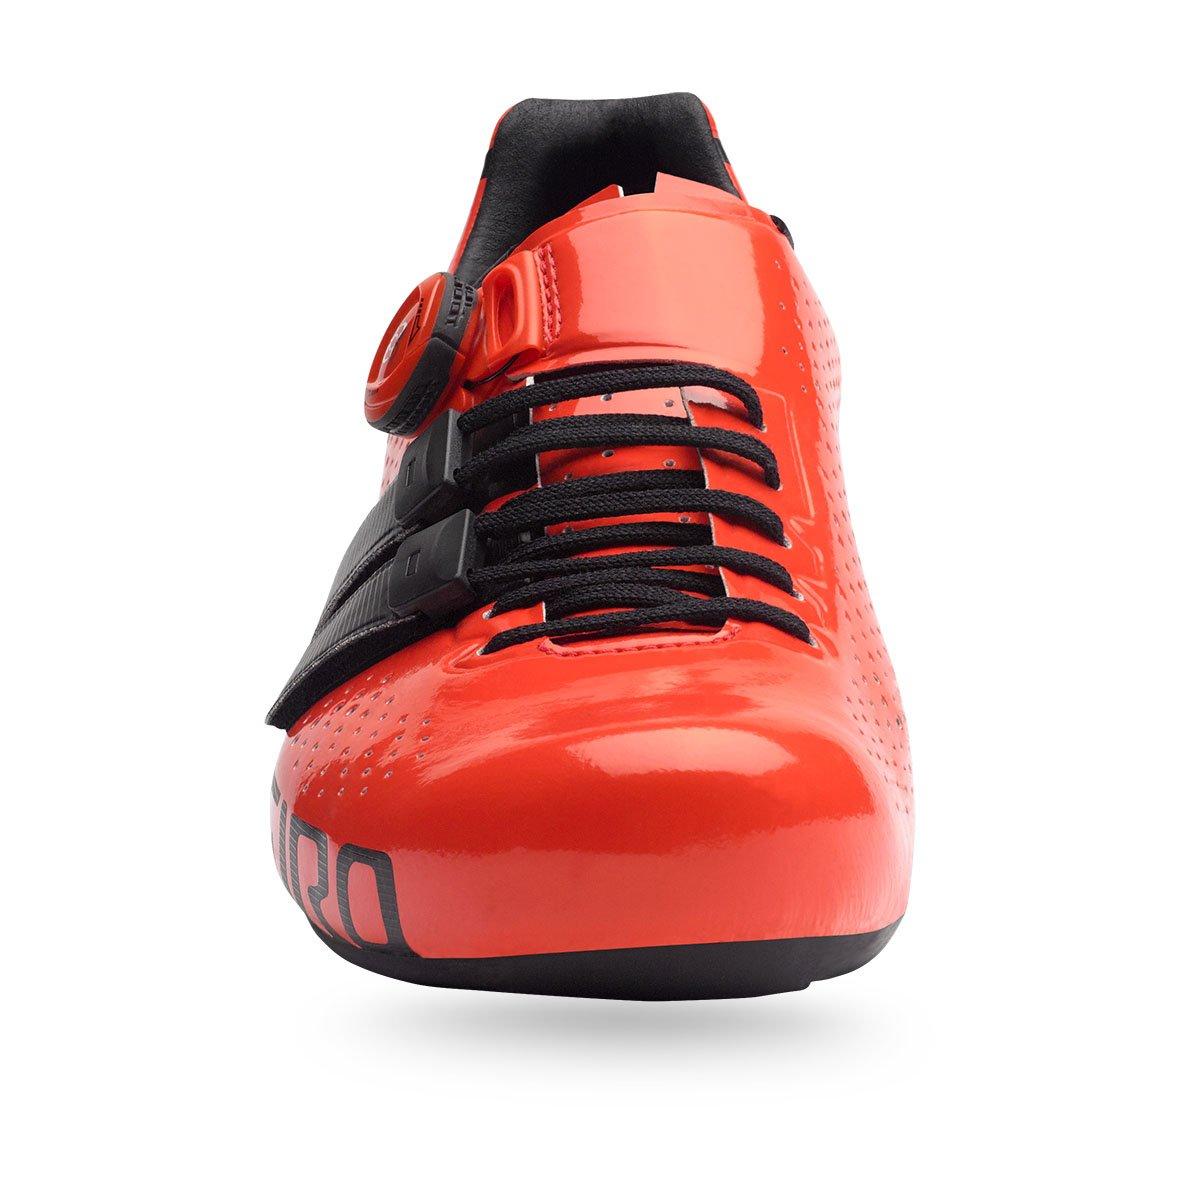 Vermillion Black 39.5 Giro shoes Factor TECHLACE